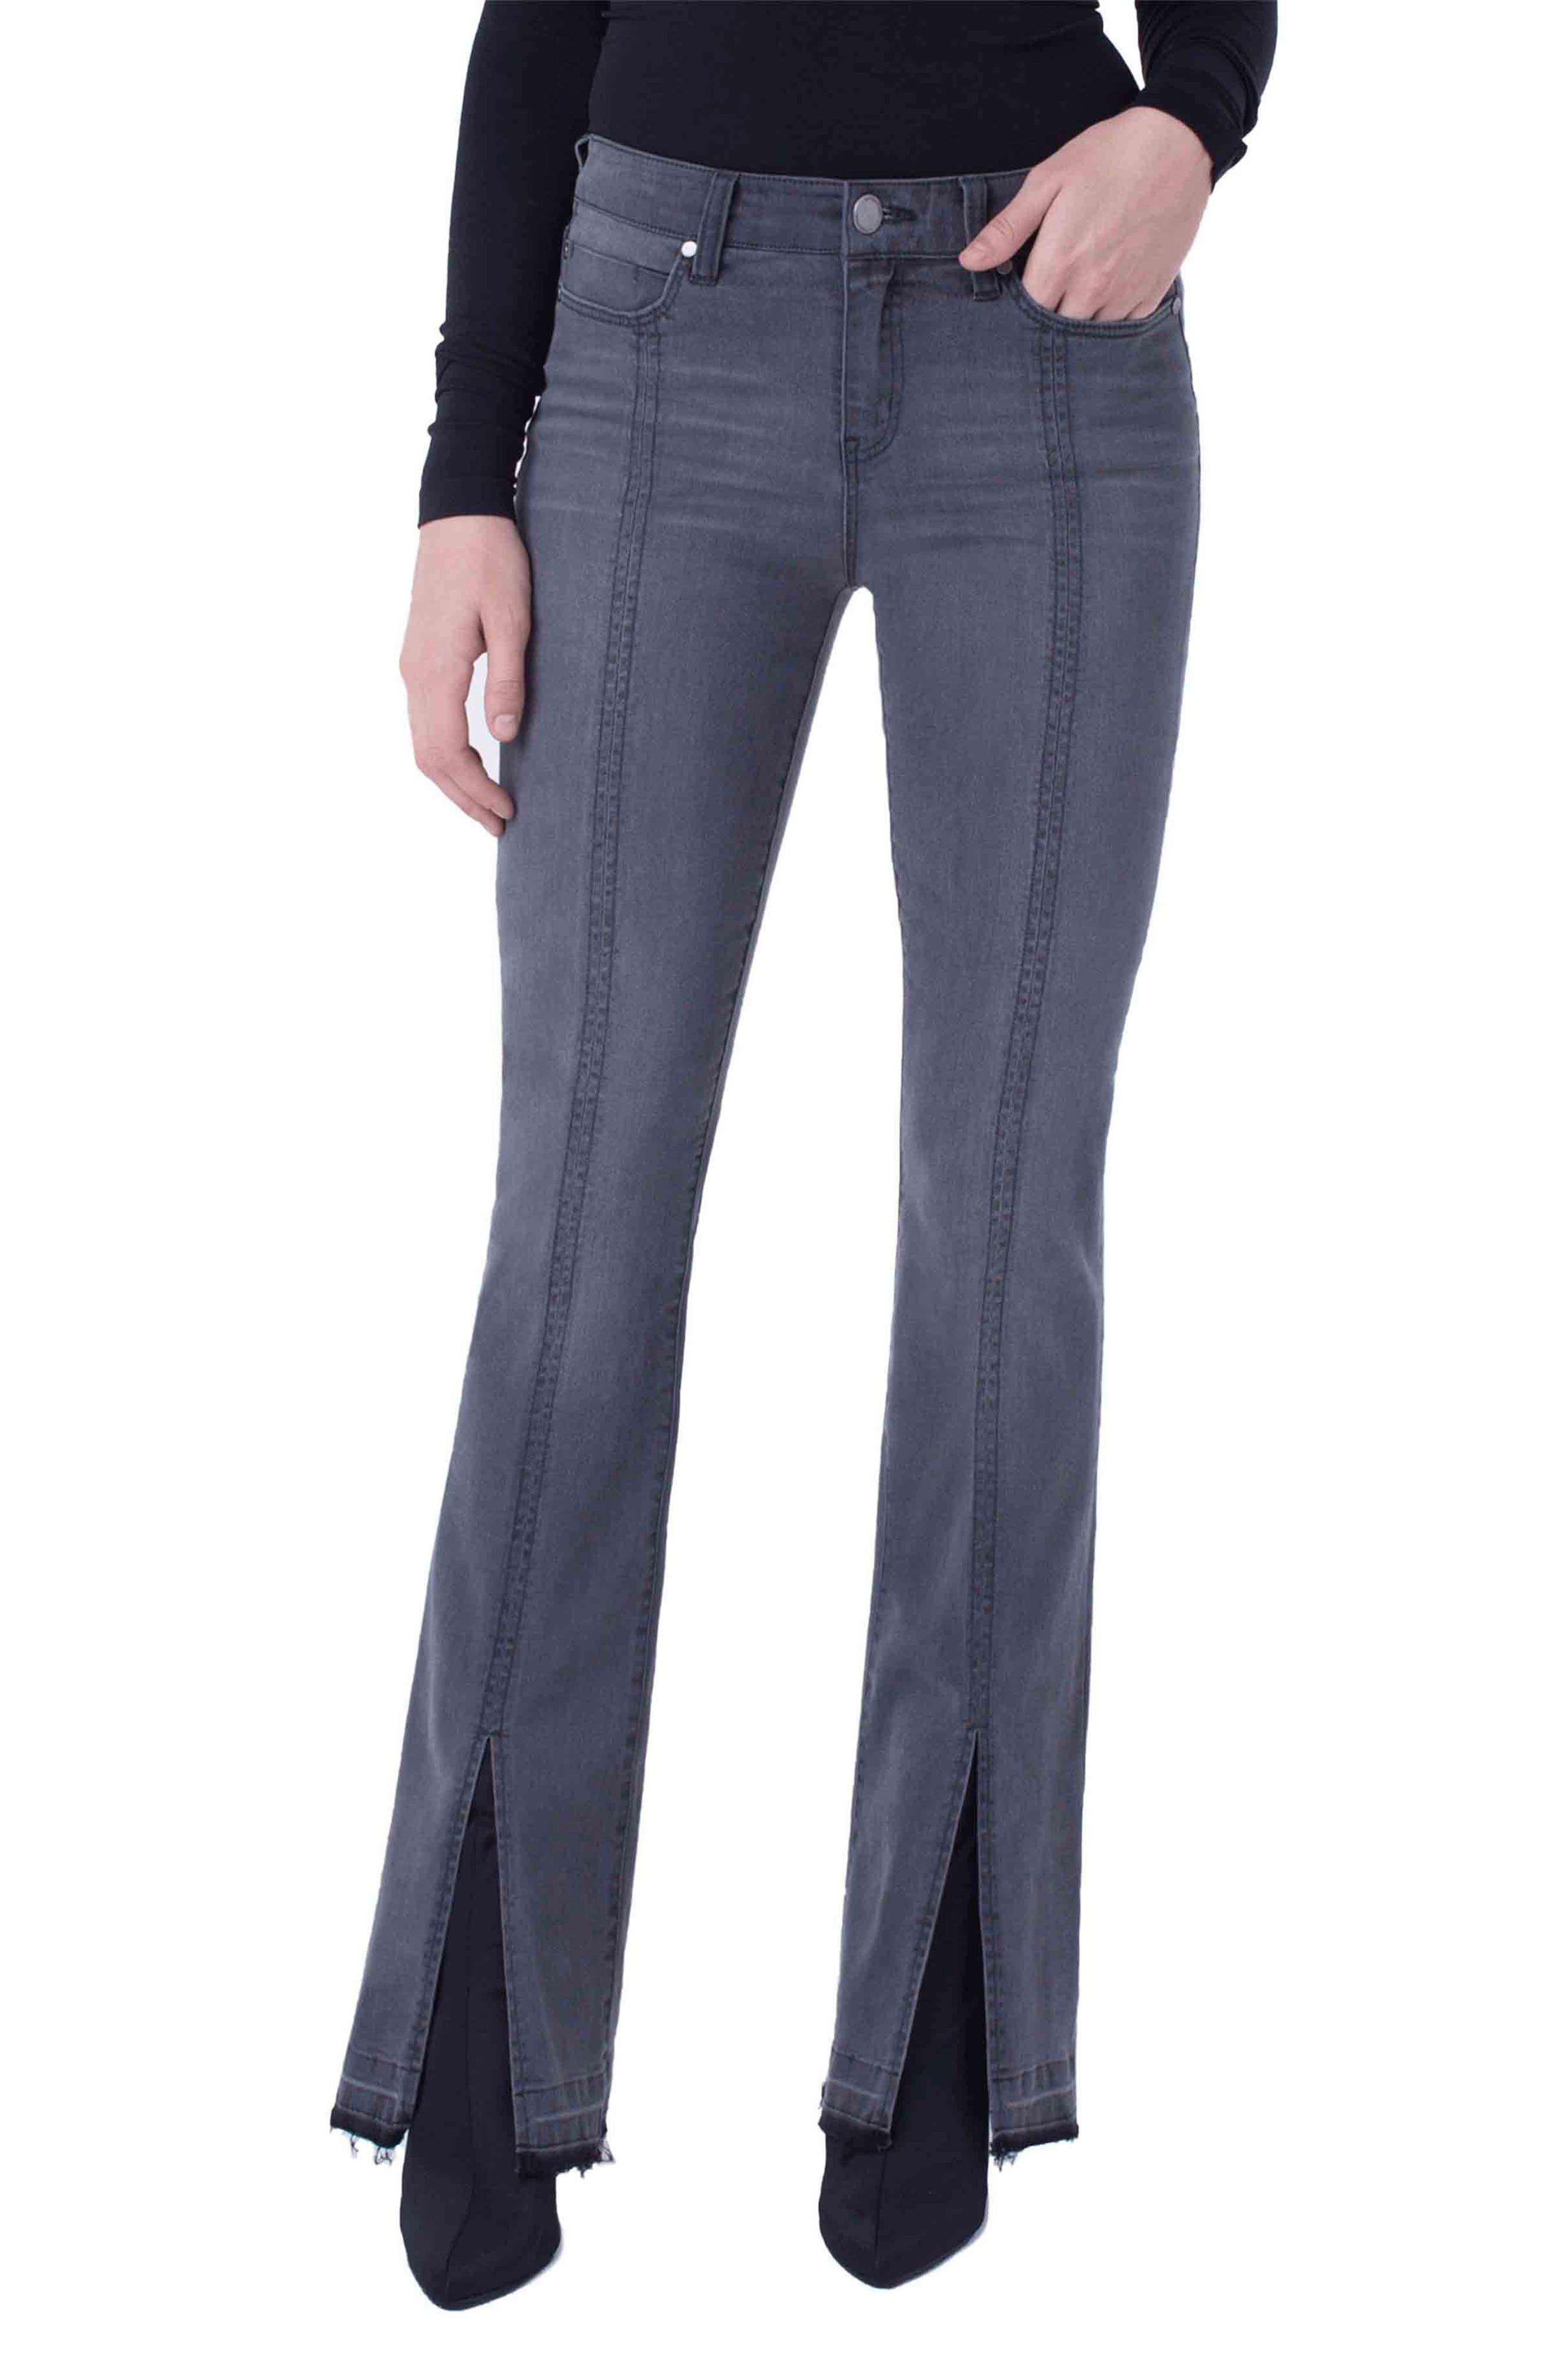 Slit Released Hem Flare Jeans In Titanium Wash